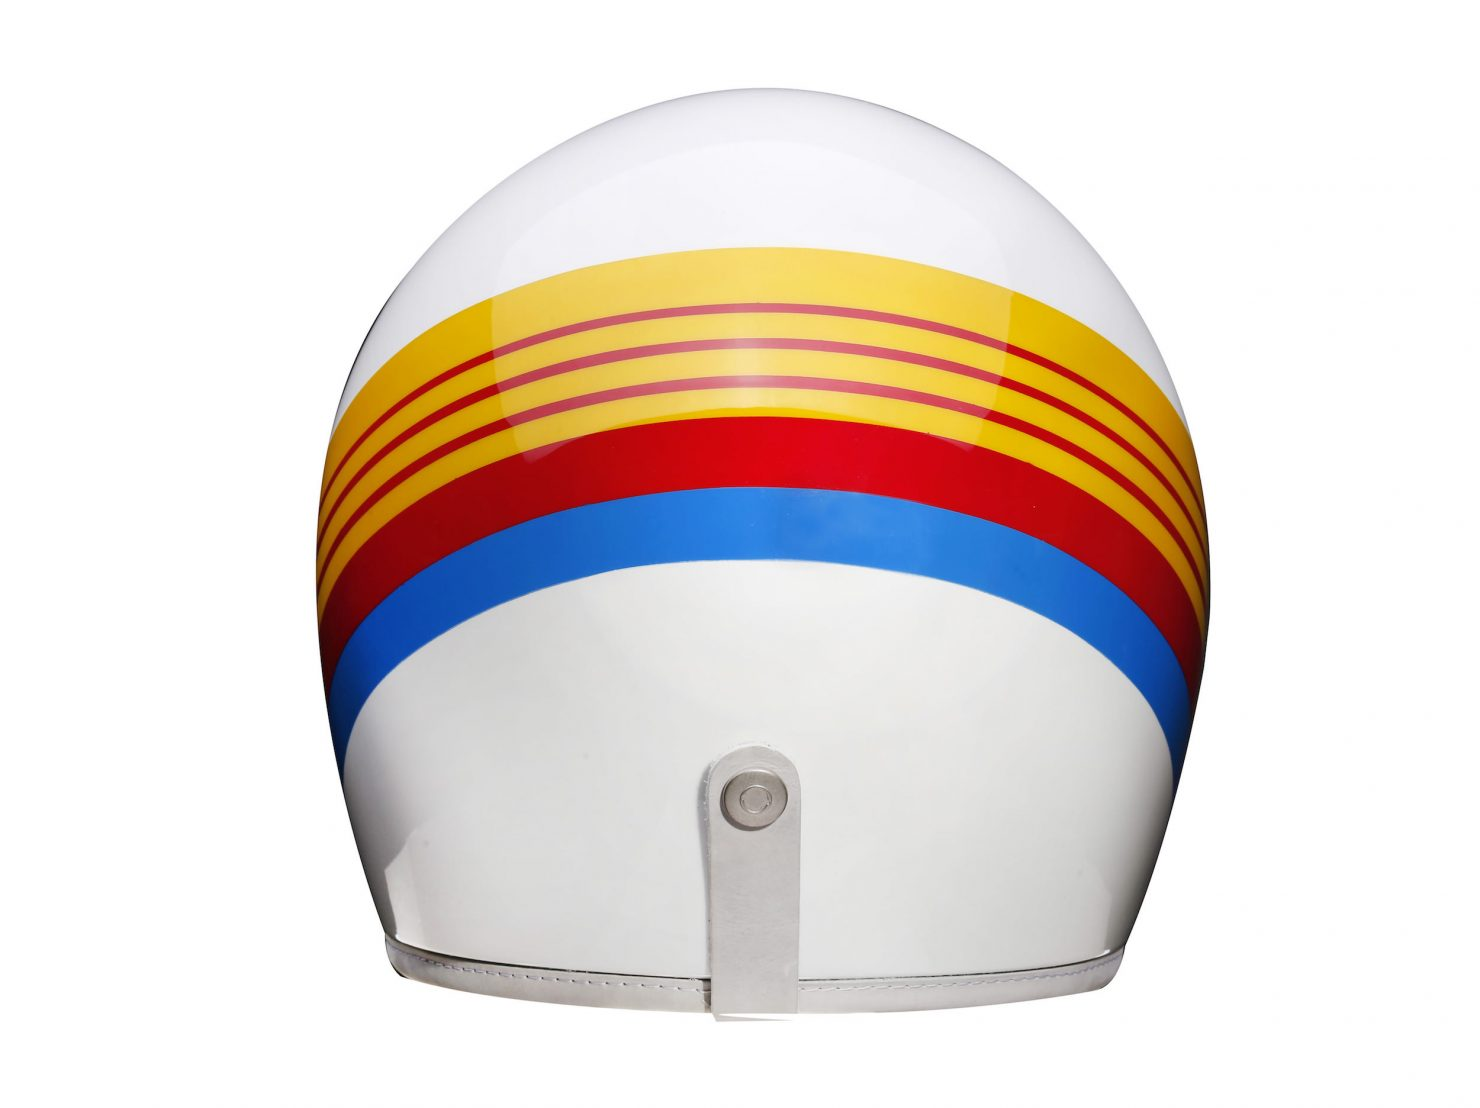 HEDON X DIRTQUAKE BACK 1480x1108 - Hedon Heroine Dirt Quake Trailblazer Helmet